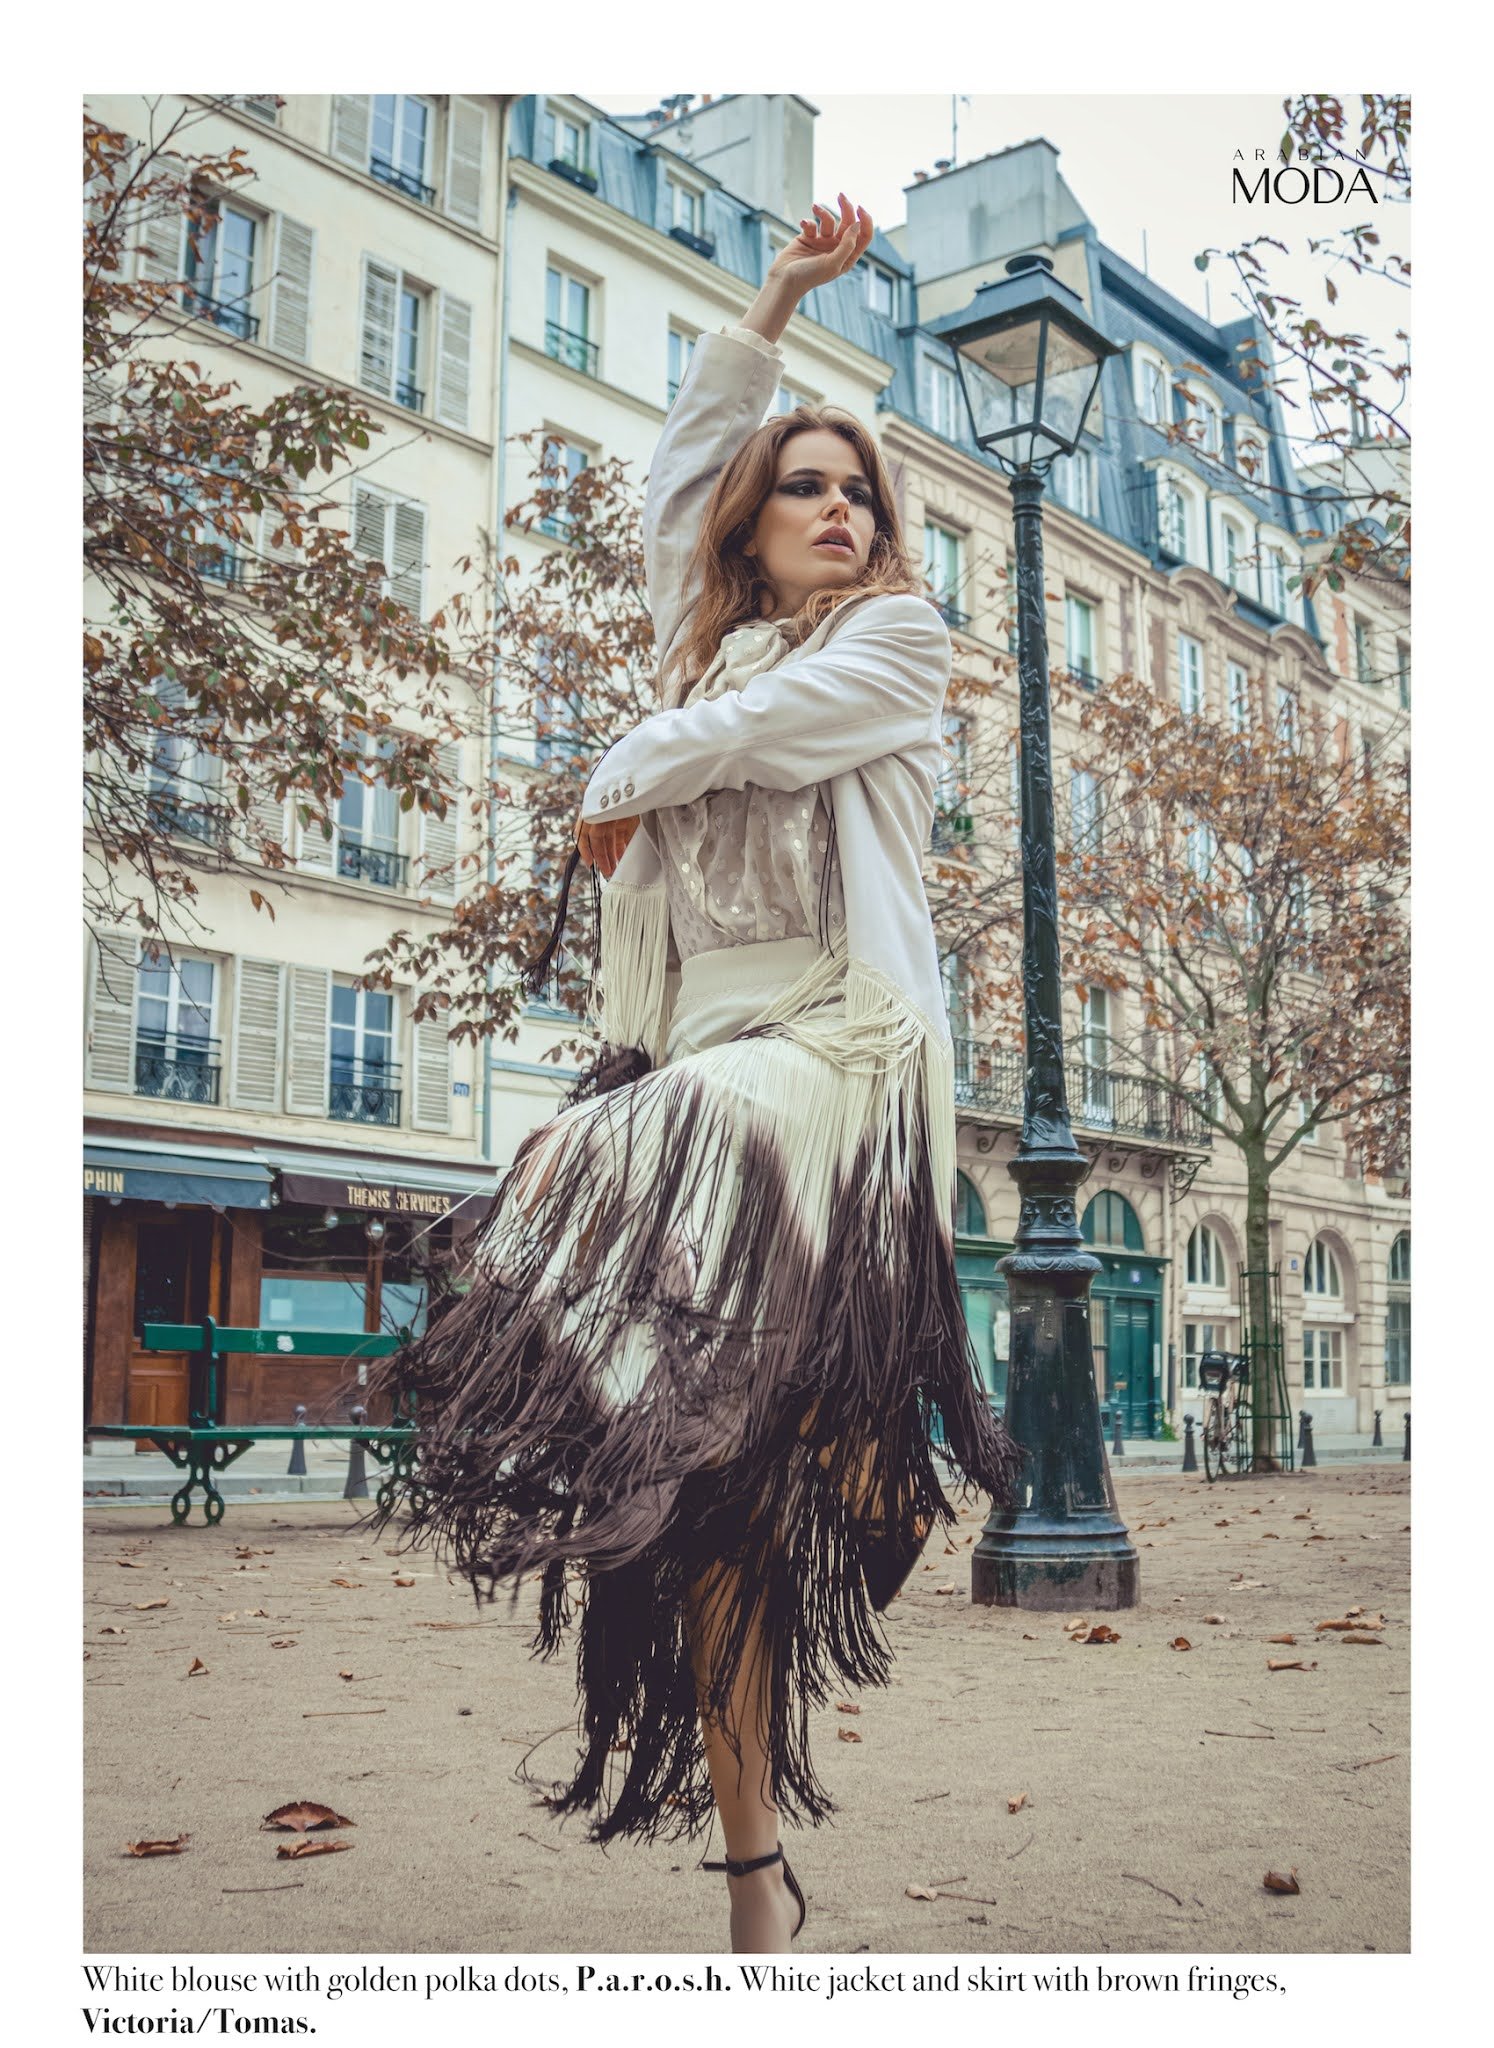 Arabian Moda x Parosh x Victoria/Tomas